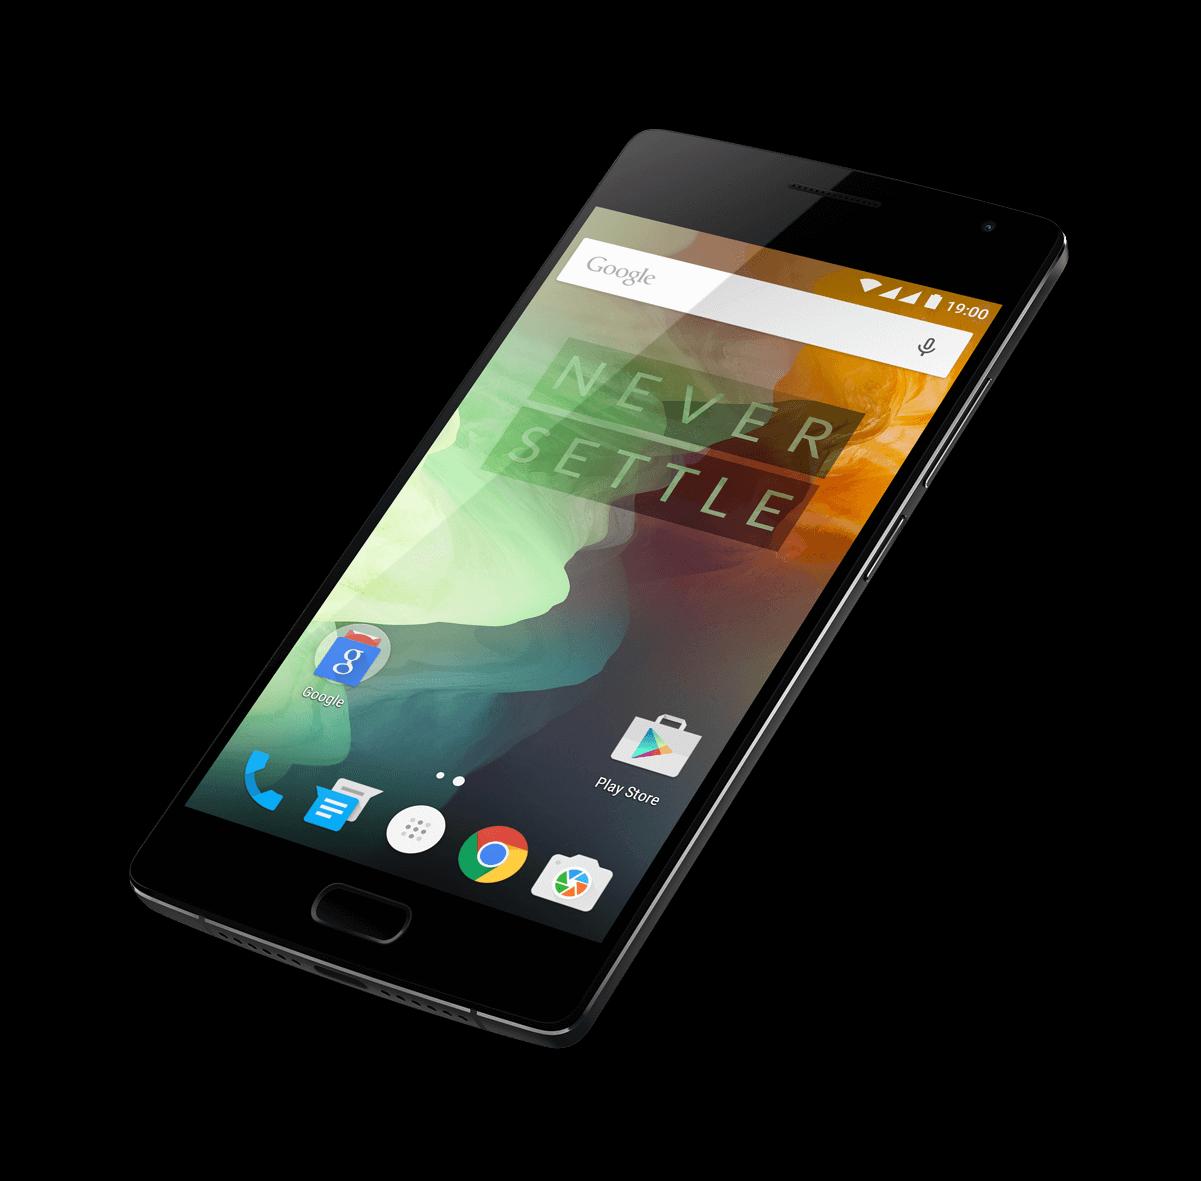 OnePlus 2 resmen a��kland�, i�te �zellikleri!